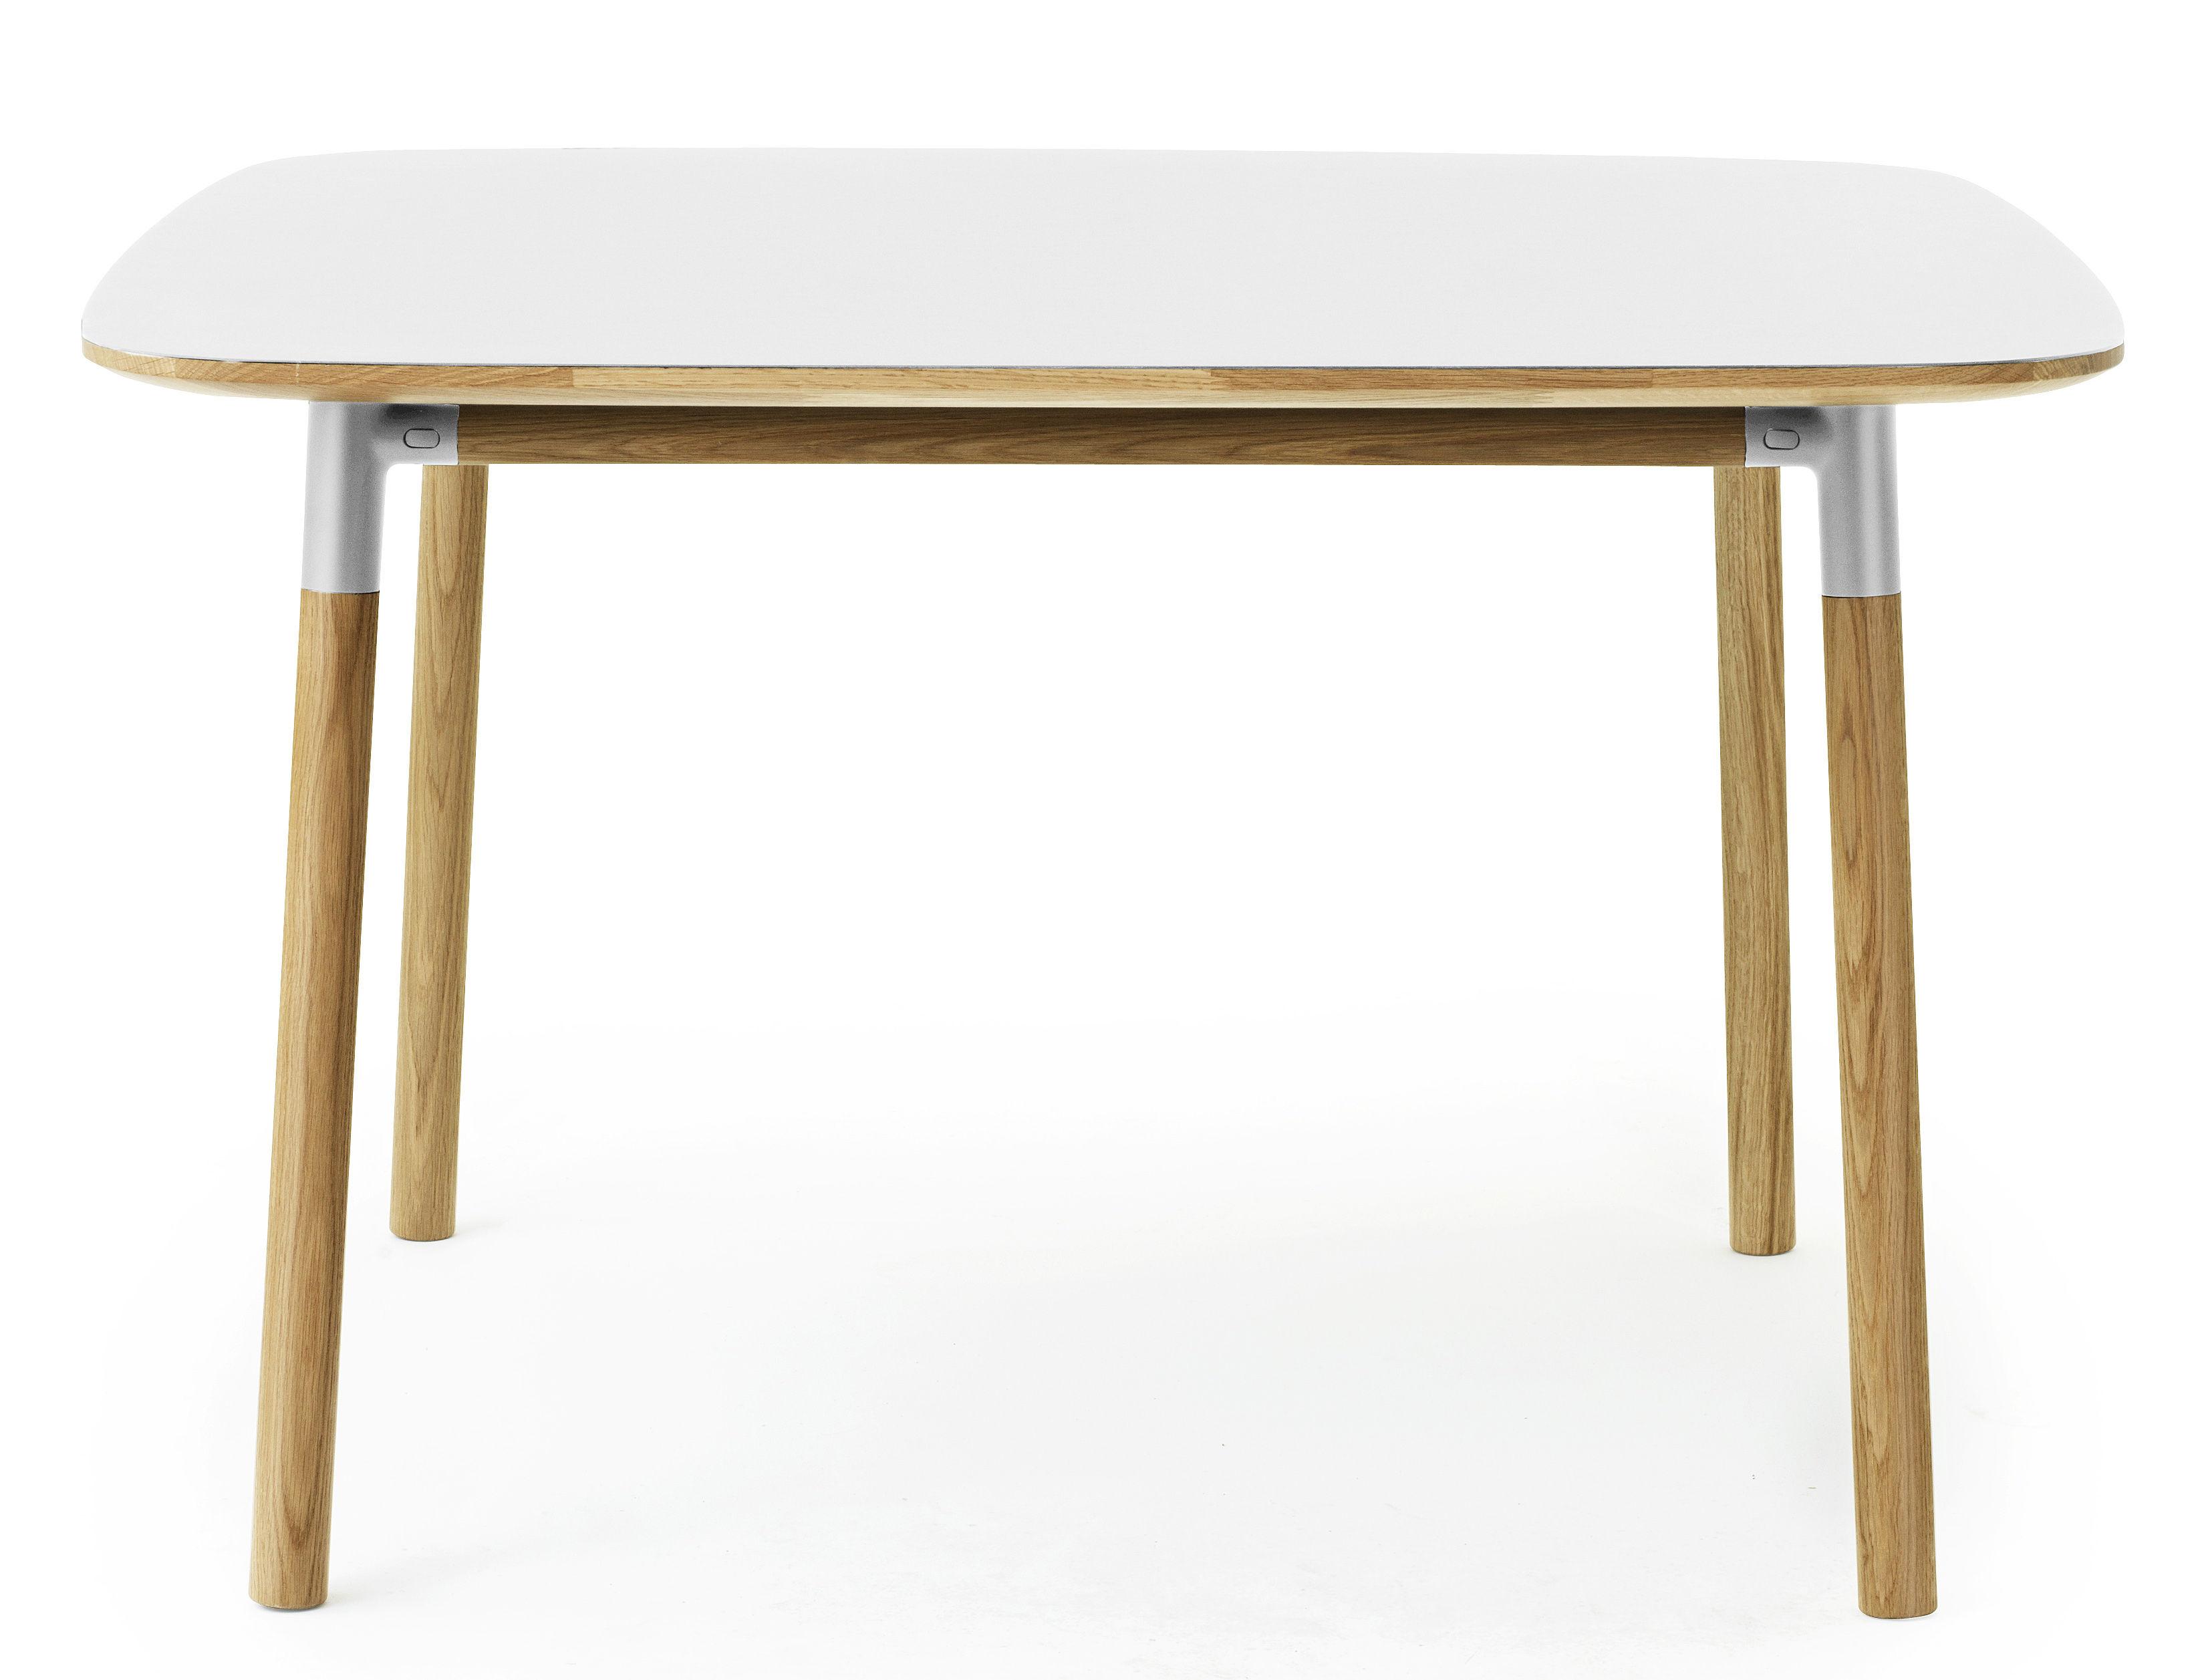 Form table 120 x 120 cm white oak by normann copenhagen for 120 table